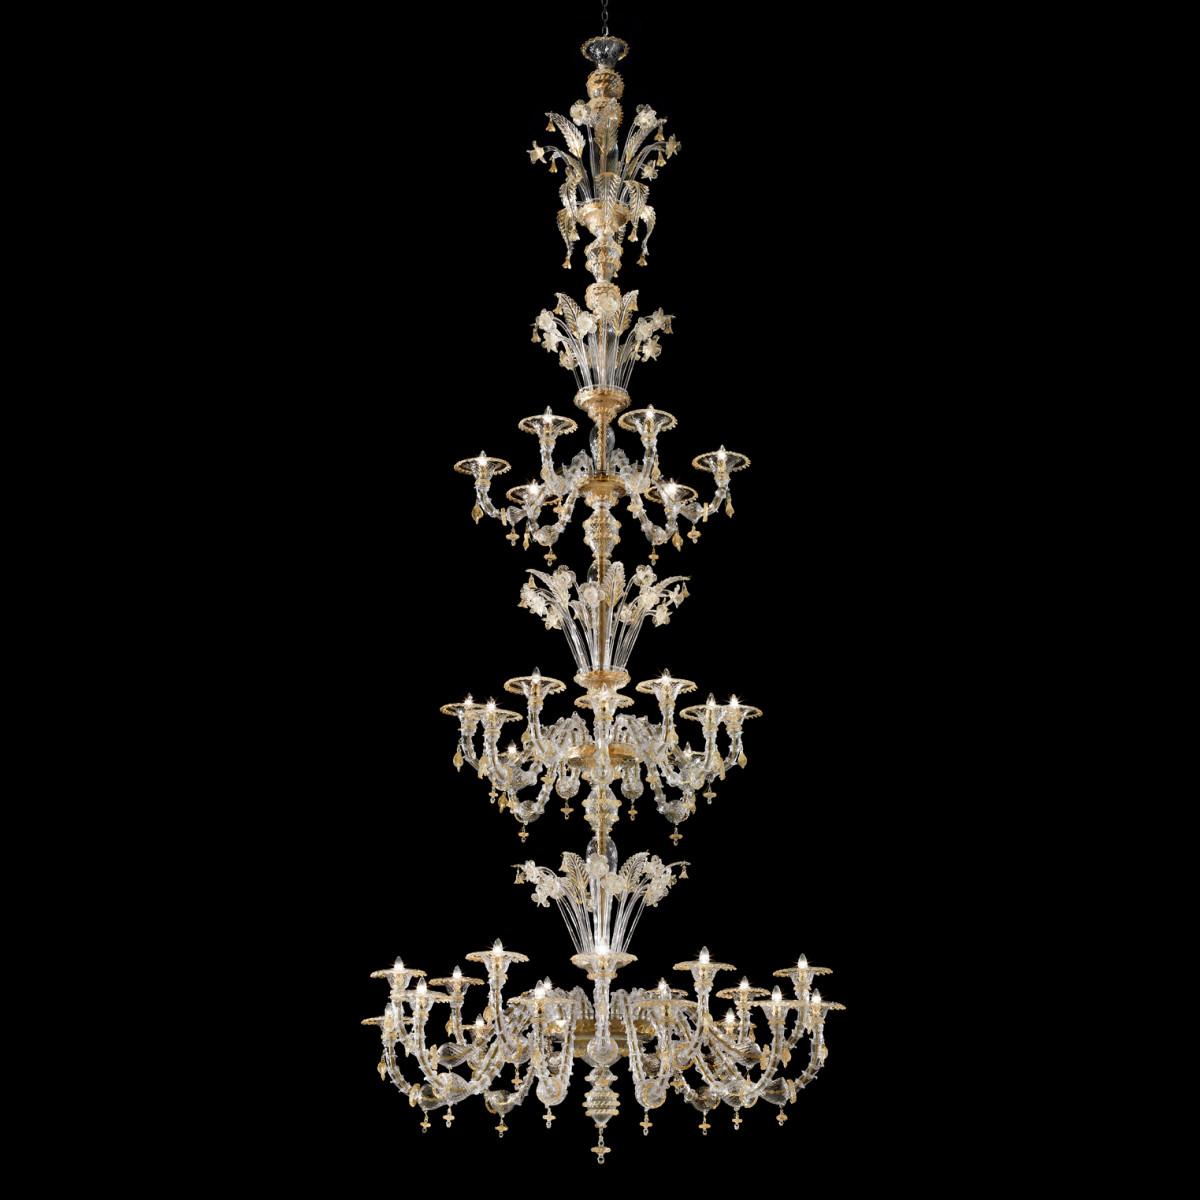 Bellini Murano glass chandelier -Transparent 24k gold color